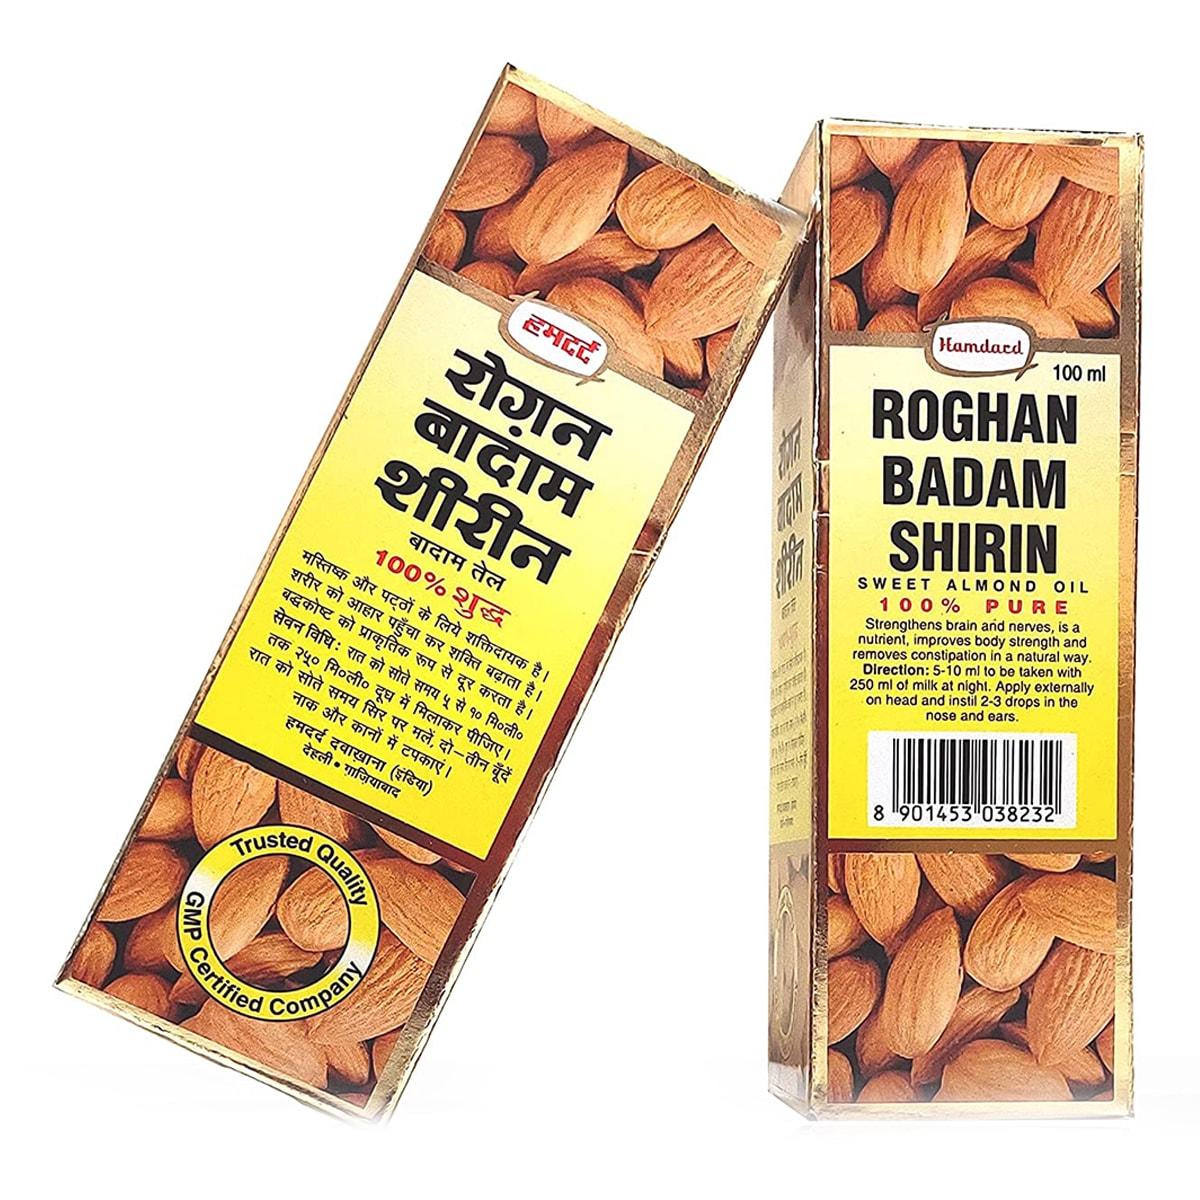 Buy Hamdard Roghan Badam Shirin (Sweet Almond Oil) - 100 ml